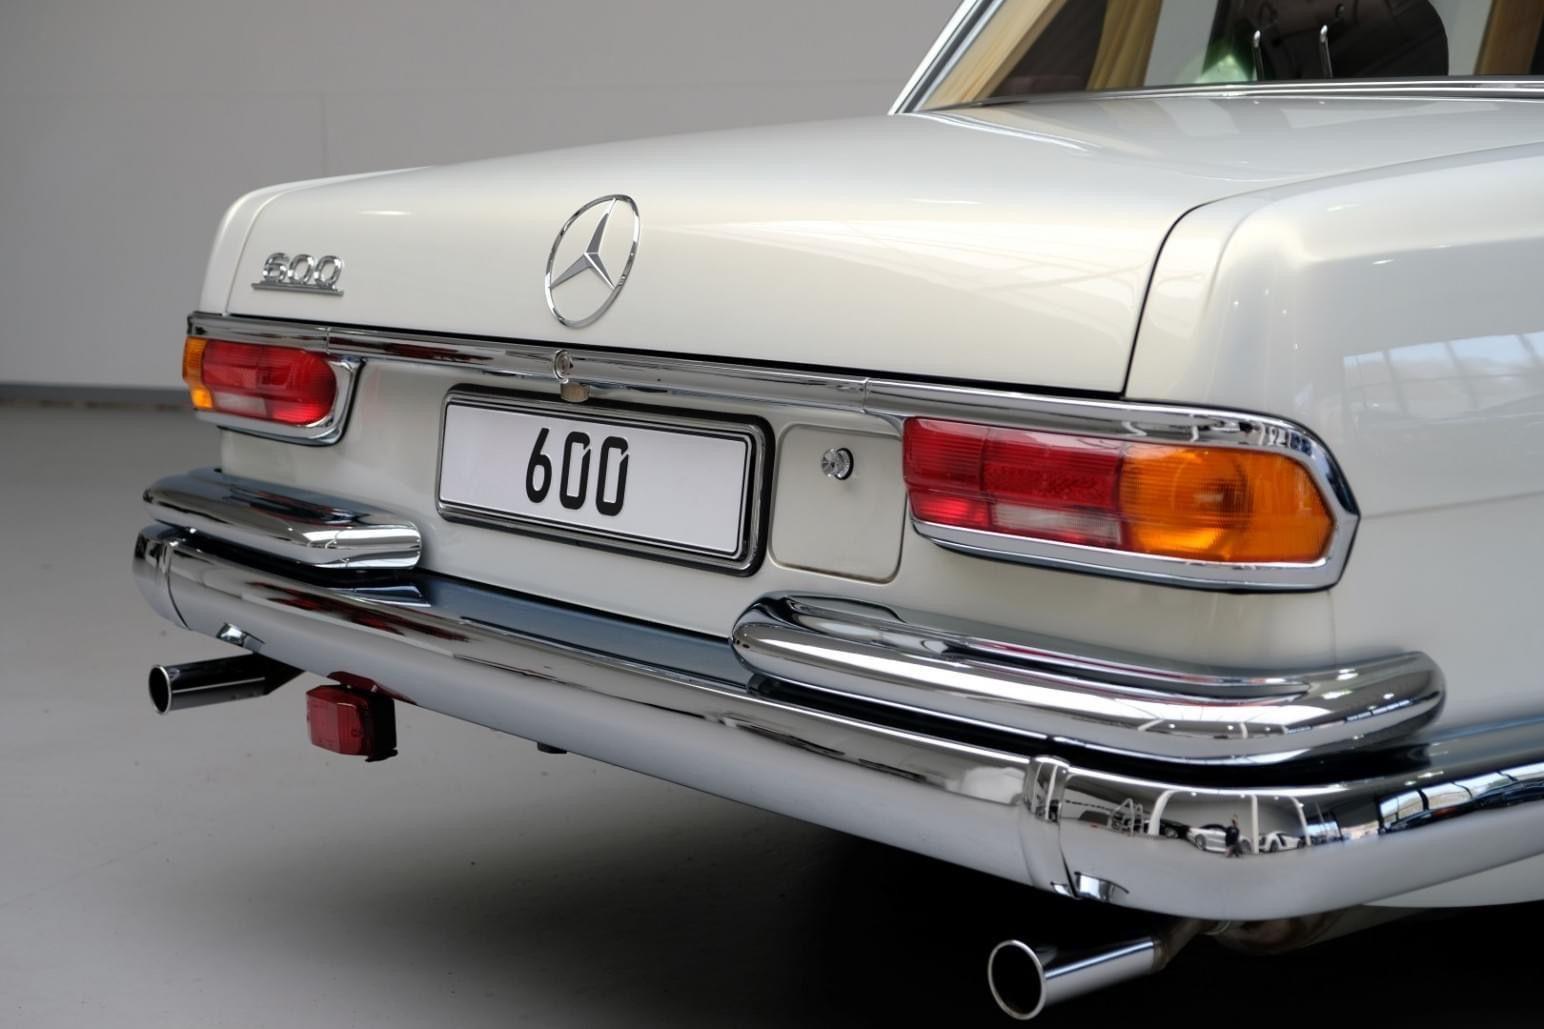 Pin by K. AZ on Mercedes 600 in 2020 Mercedes 600